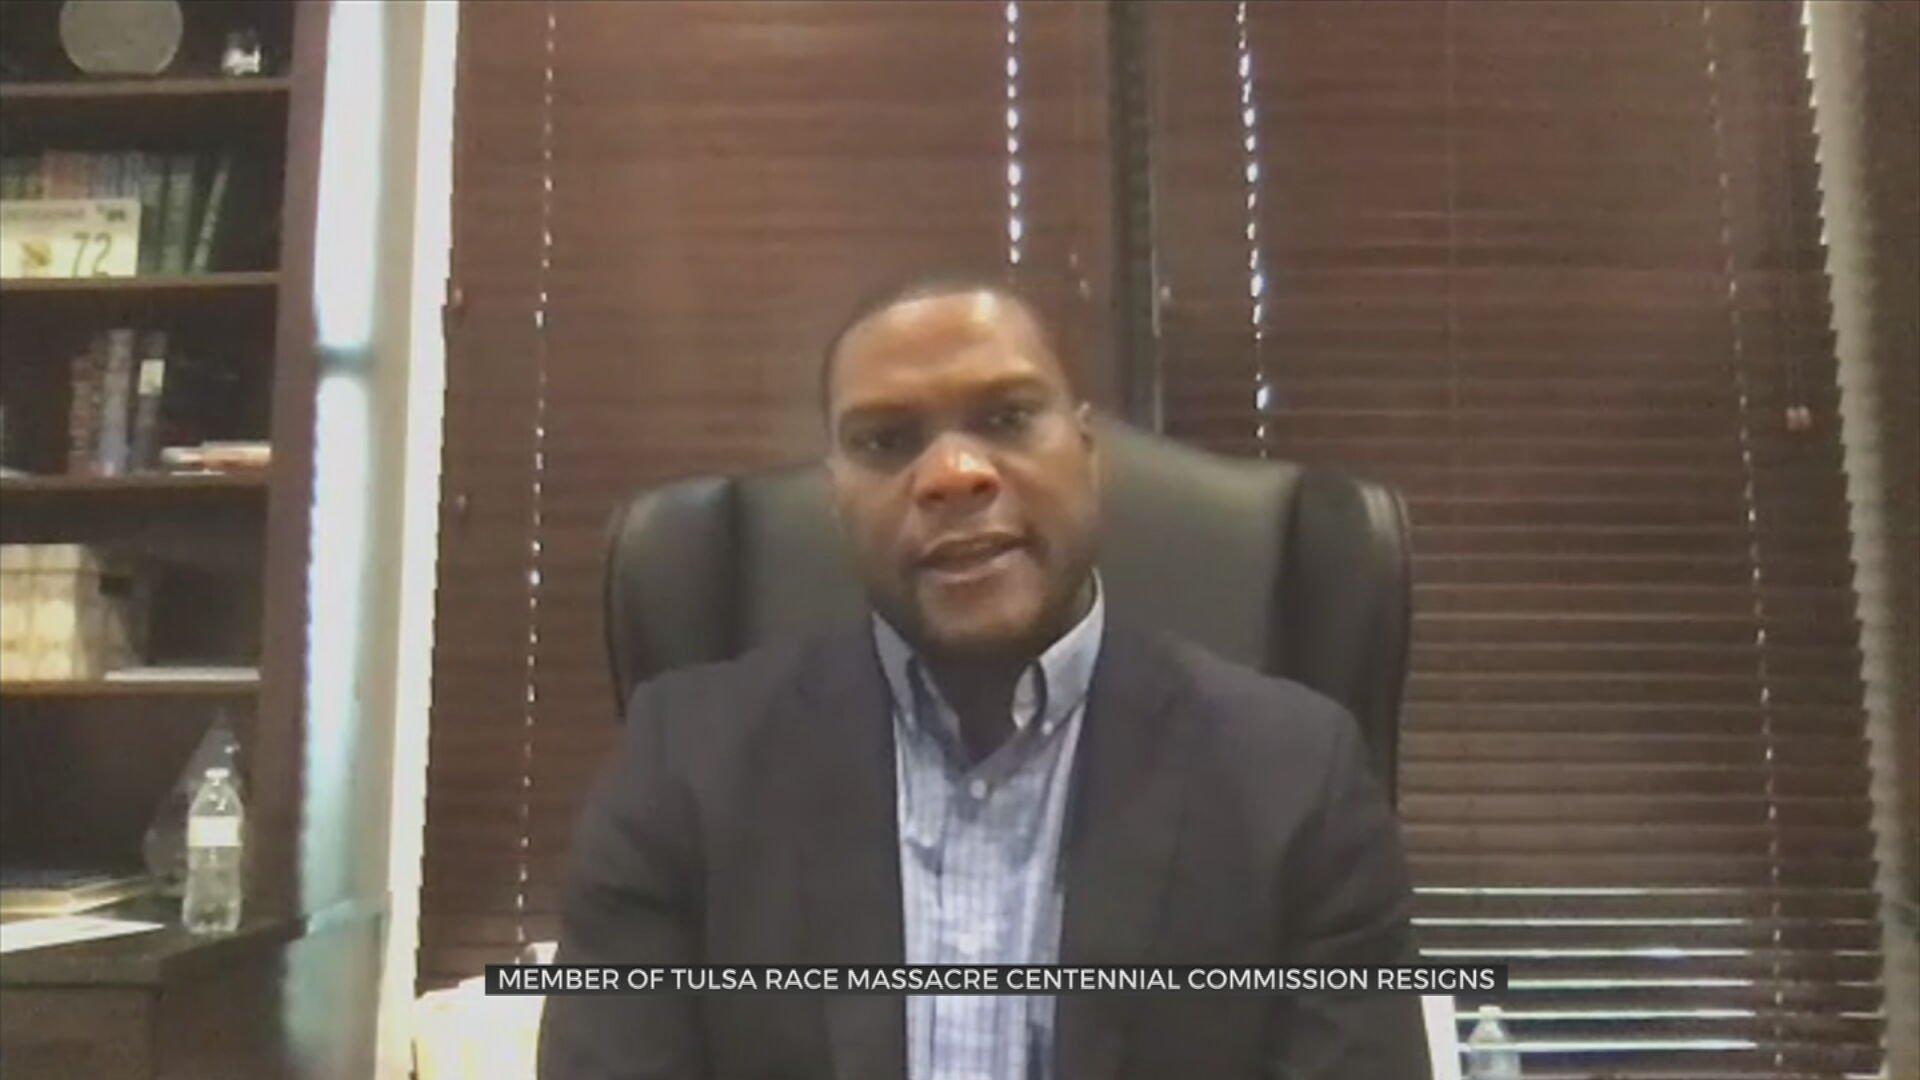 Tulsa Lawmaker Resigns From Race Massacre Centennial Commission